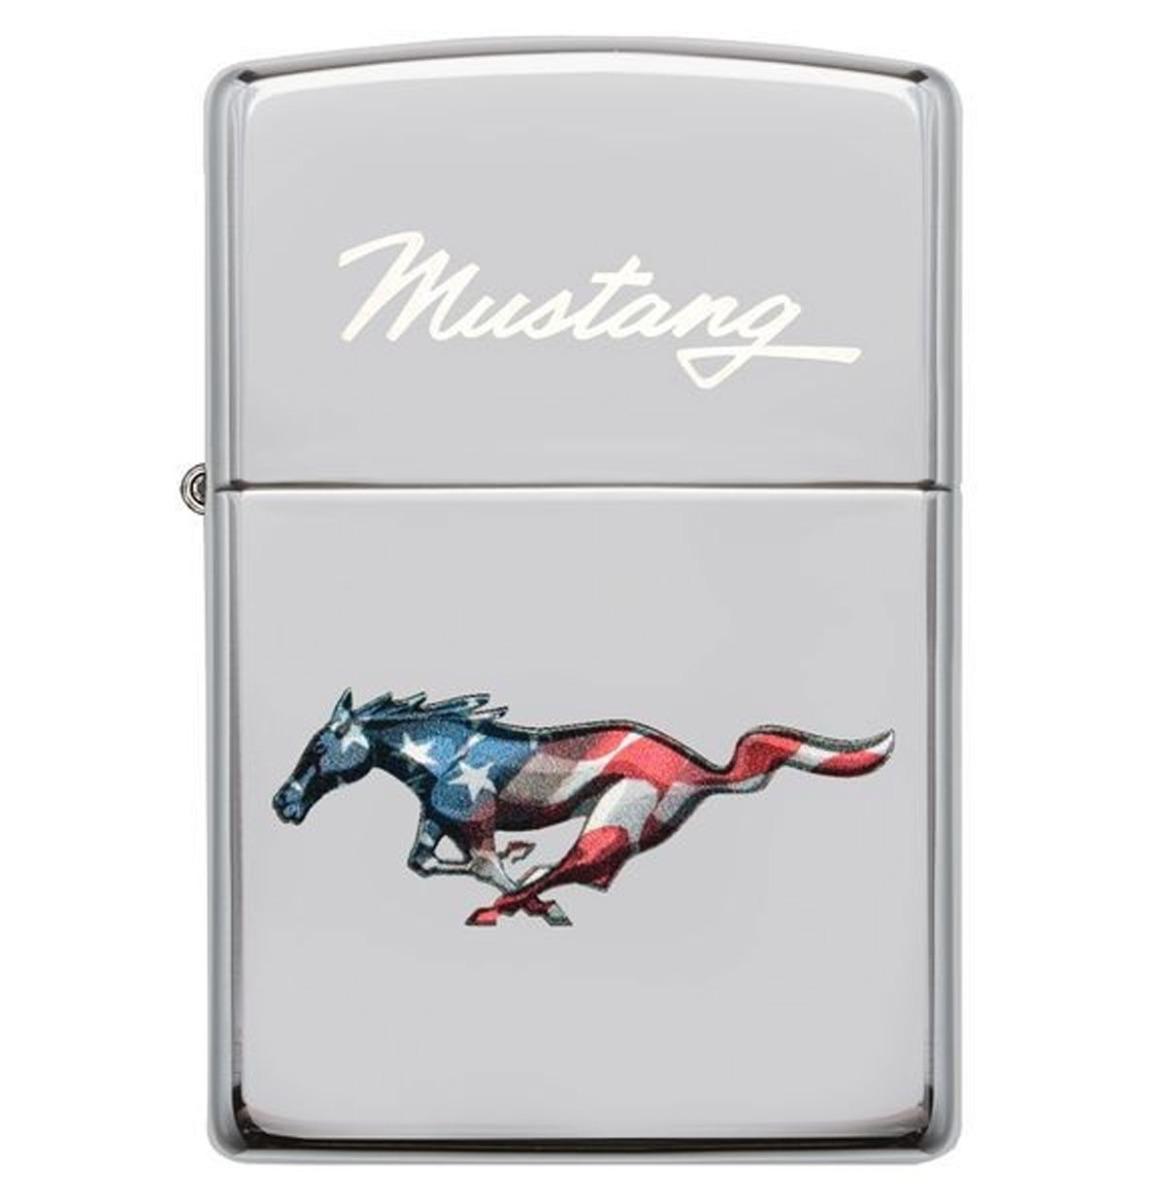 Zippo Aansteker Ford Mustang Amerikaans Paard